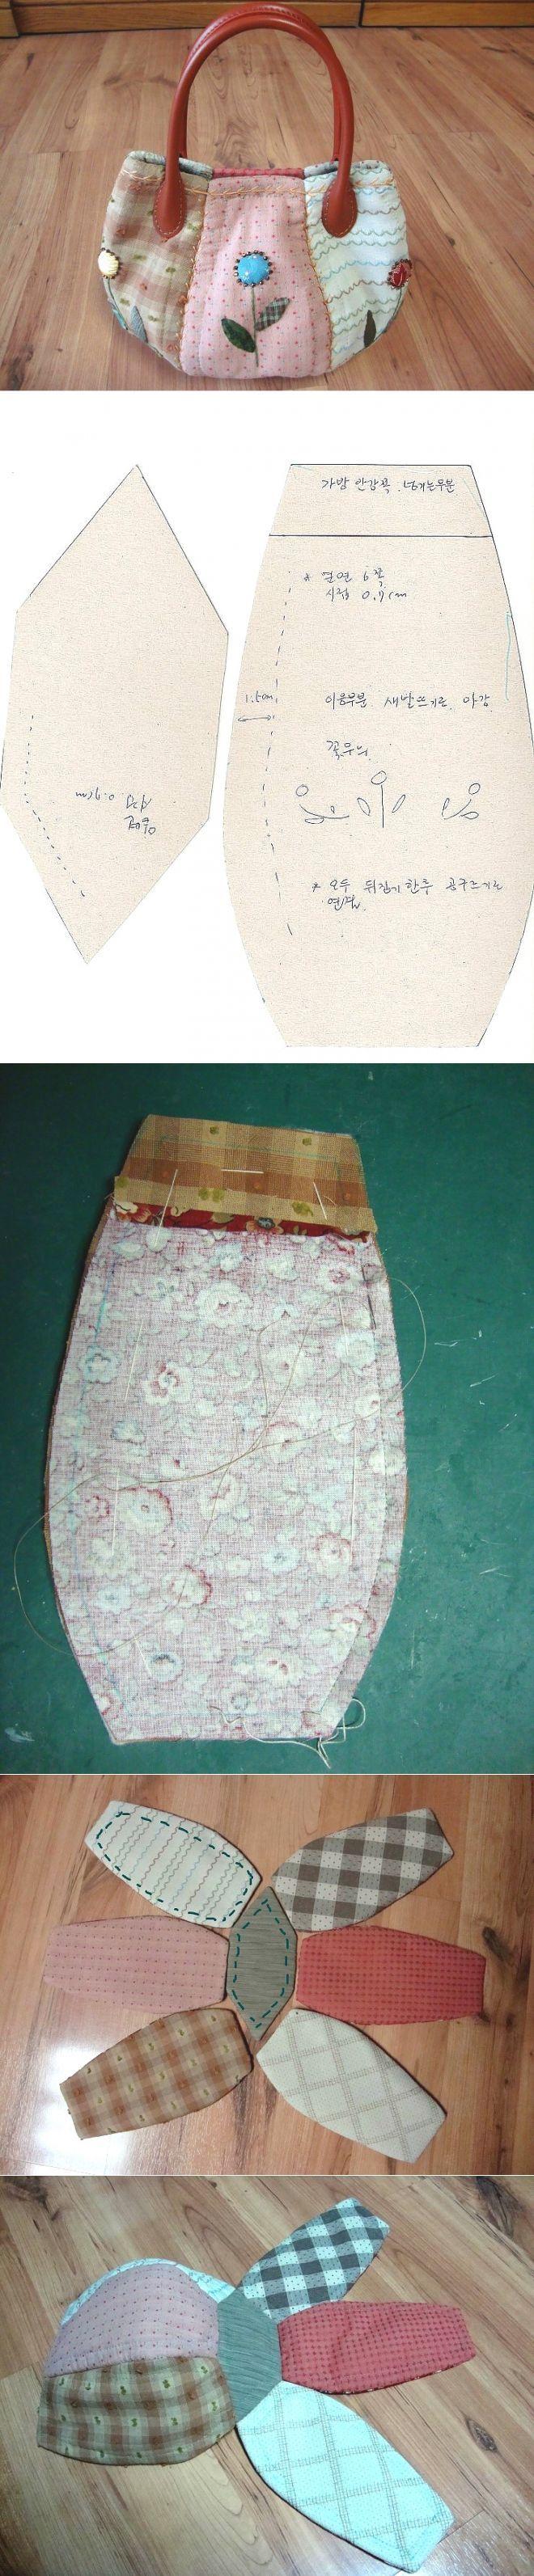 Simple Bag Quilting. Simple bag. ~